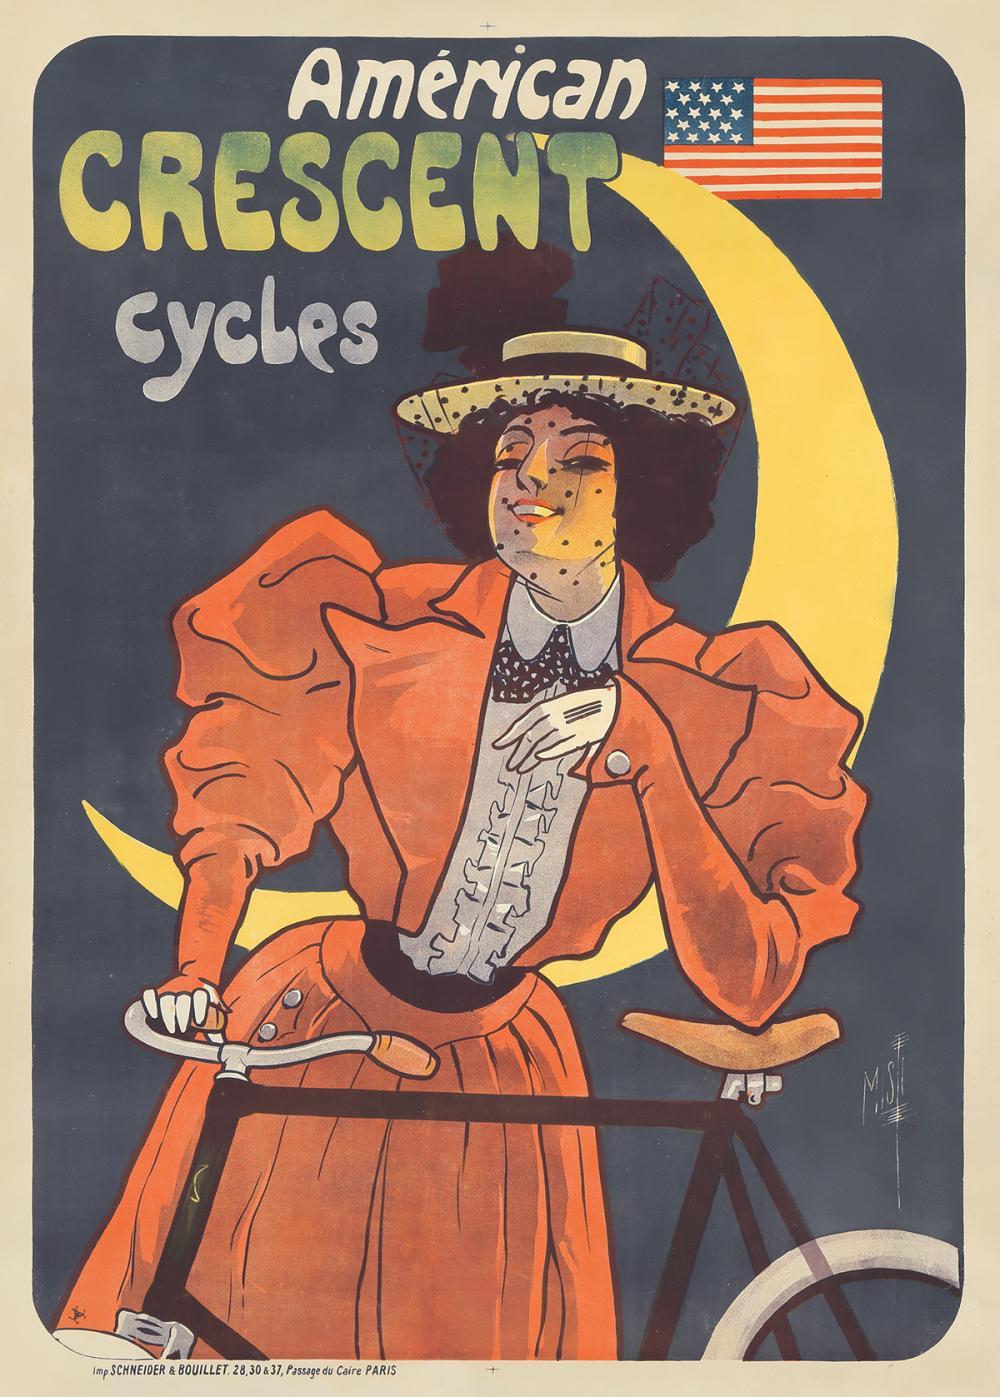 Américan Crescent Cycles. 1897.